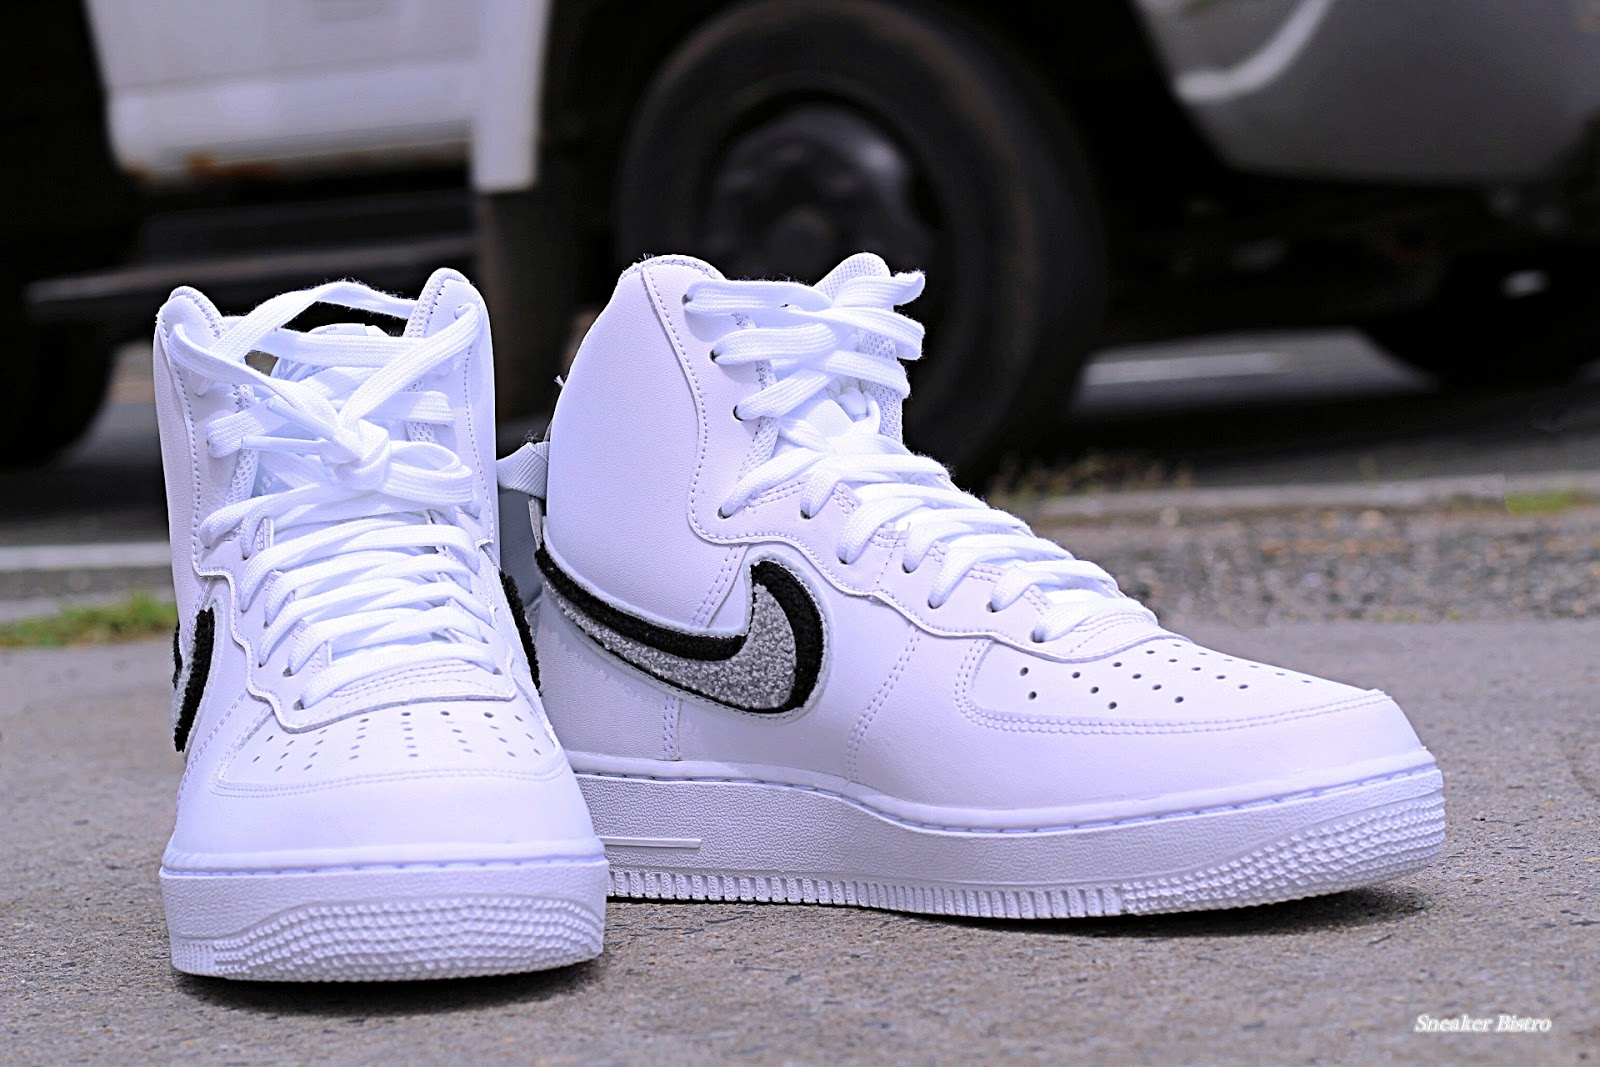 sale retailer e1c78 ea396 Nike Air Force 1 07 LV8 Chenille Swoosh